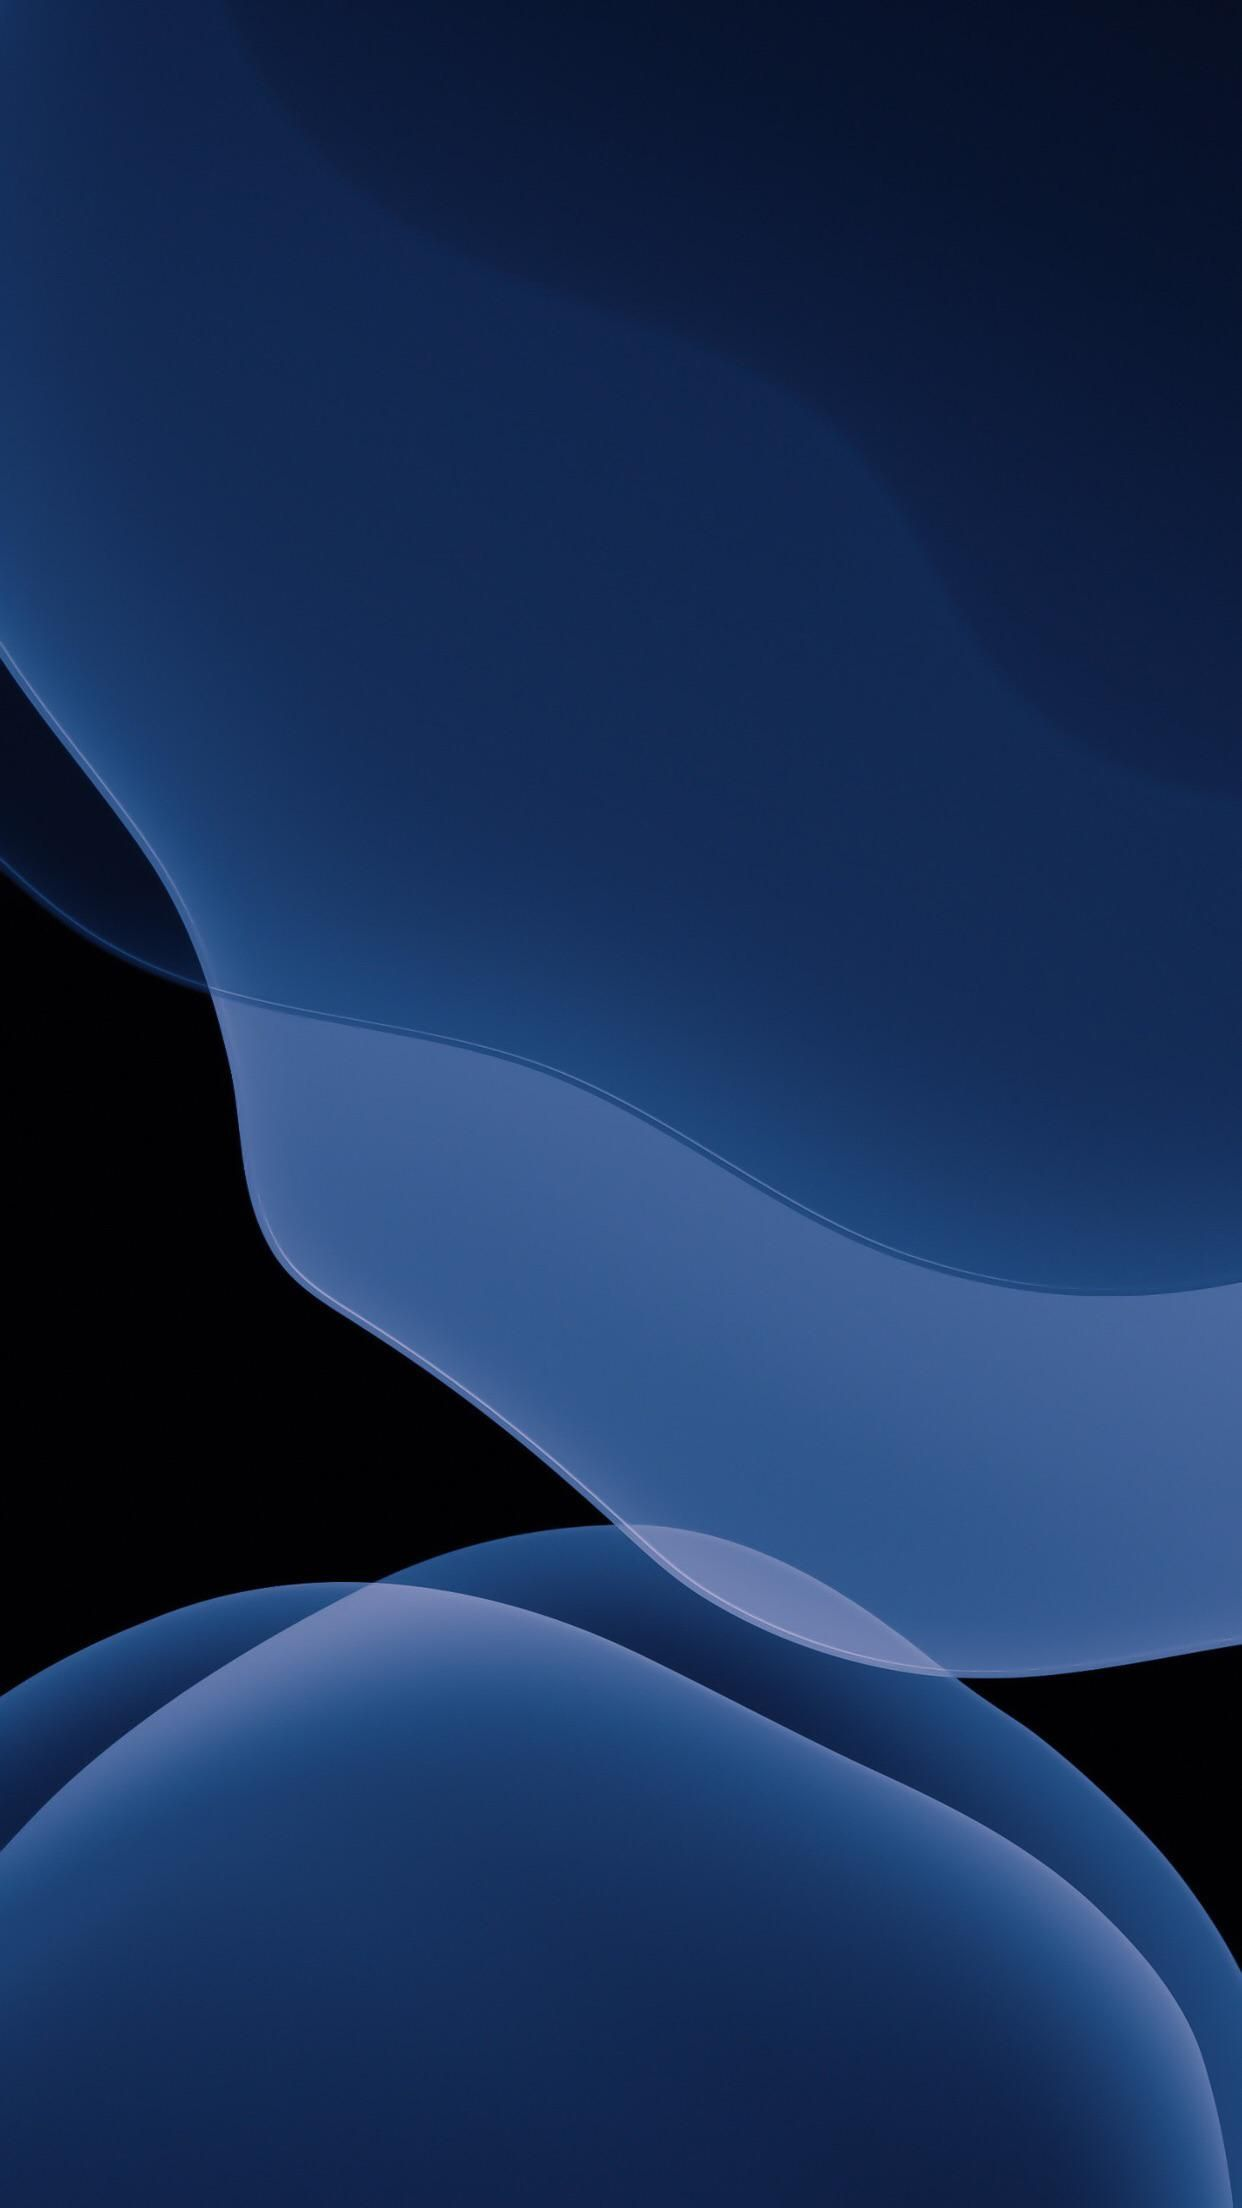 iOS 13 stock Midnight Blue (Dark) for all iphone